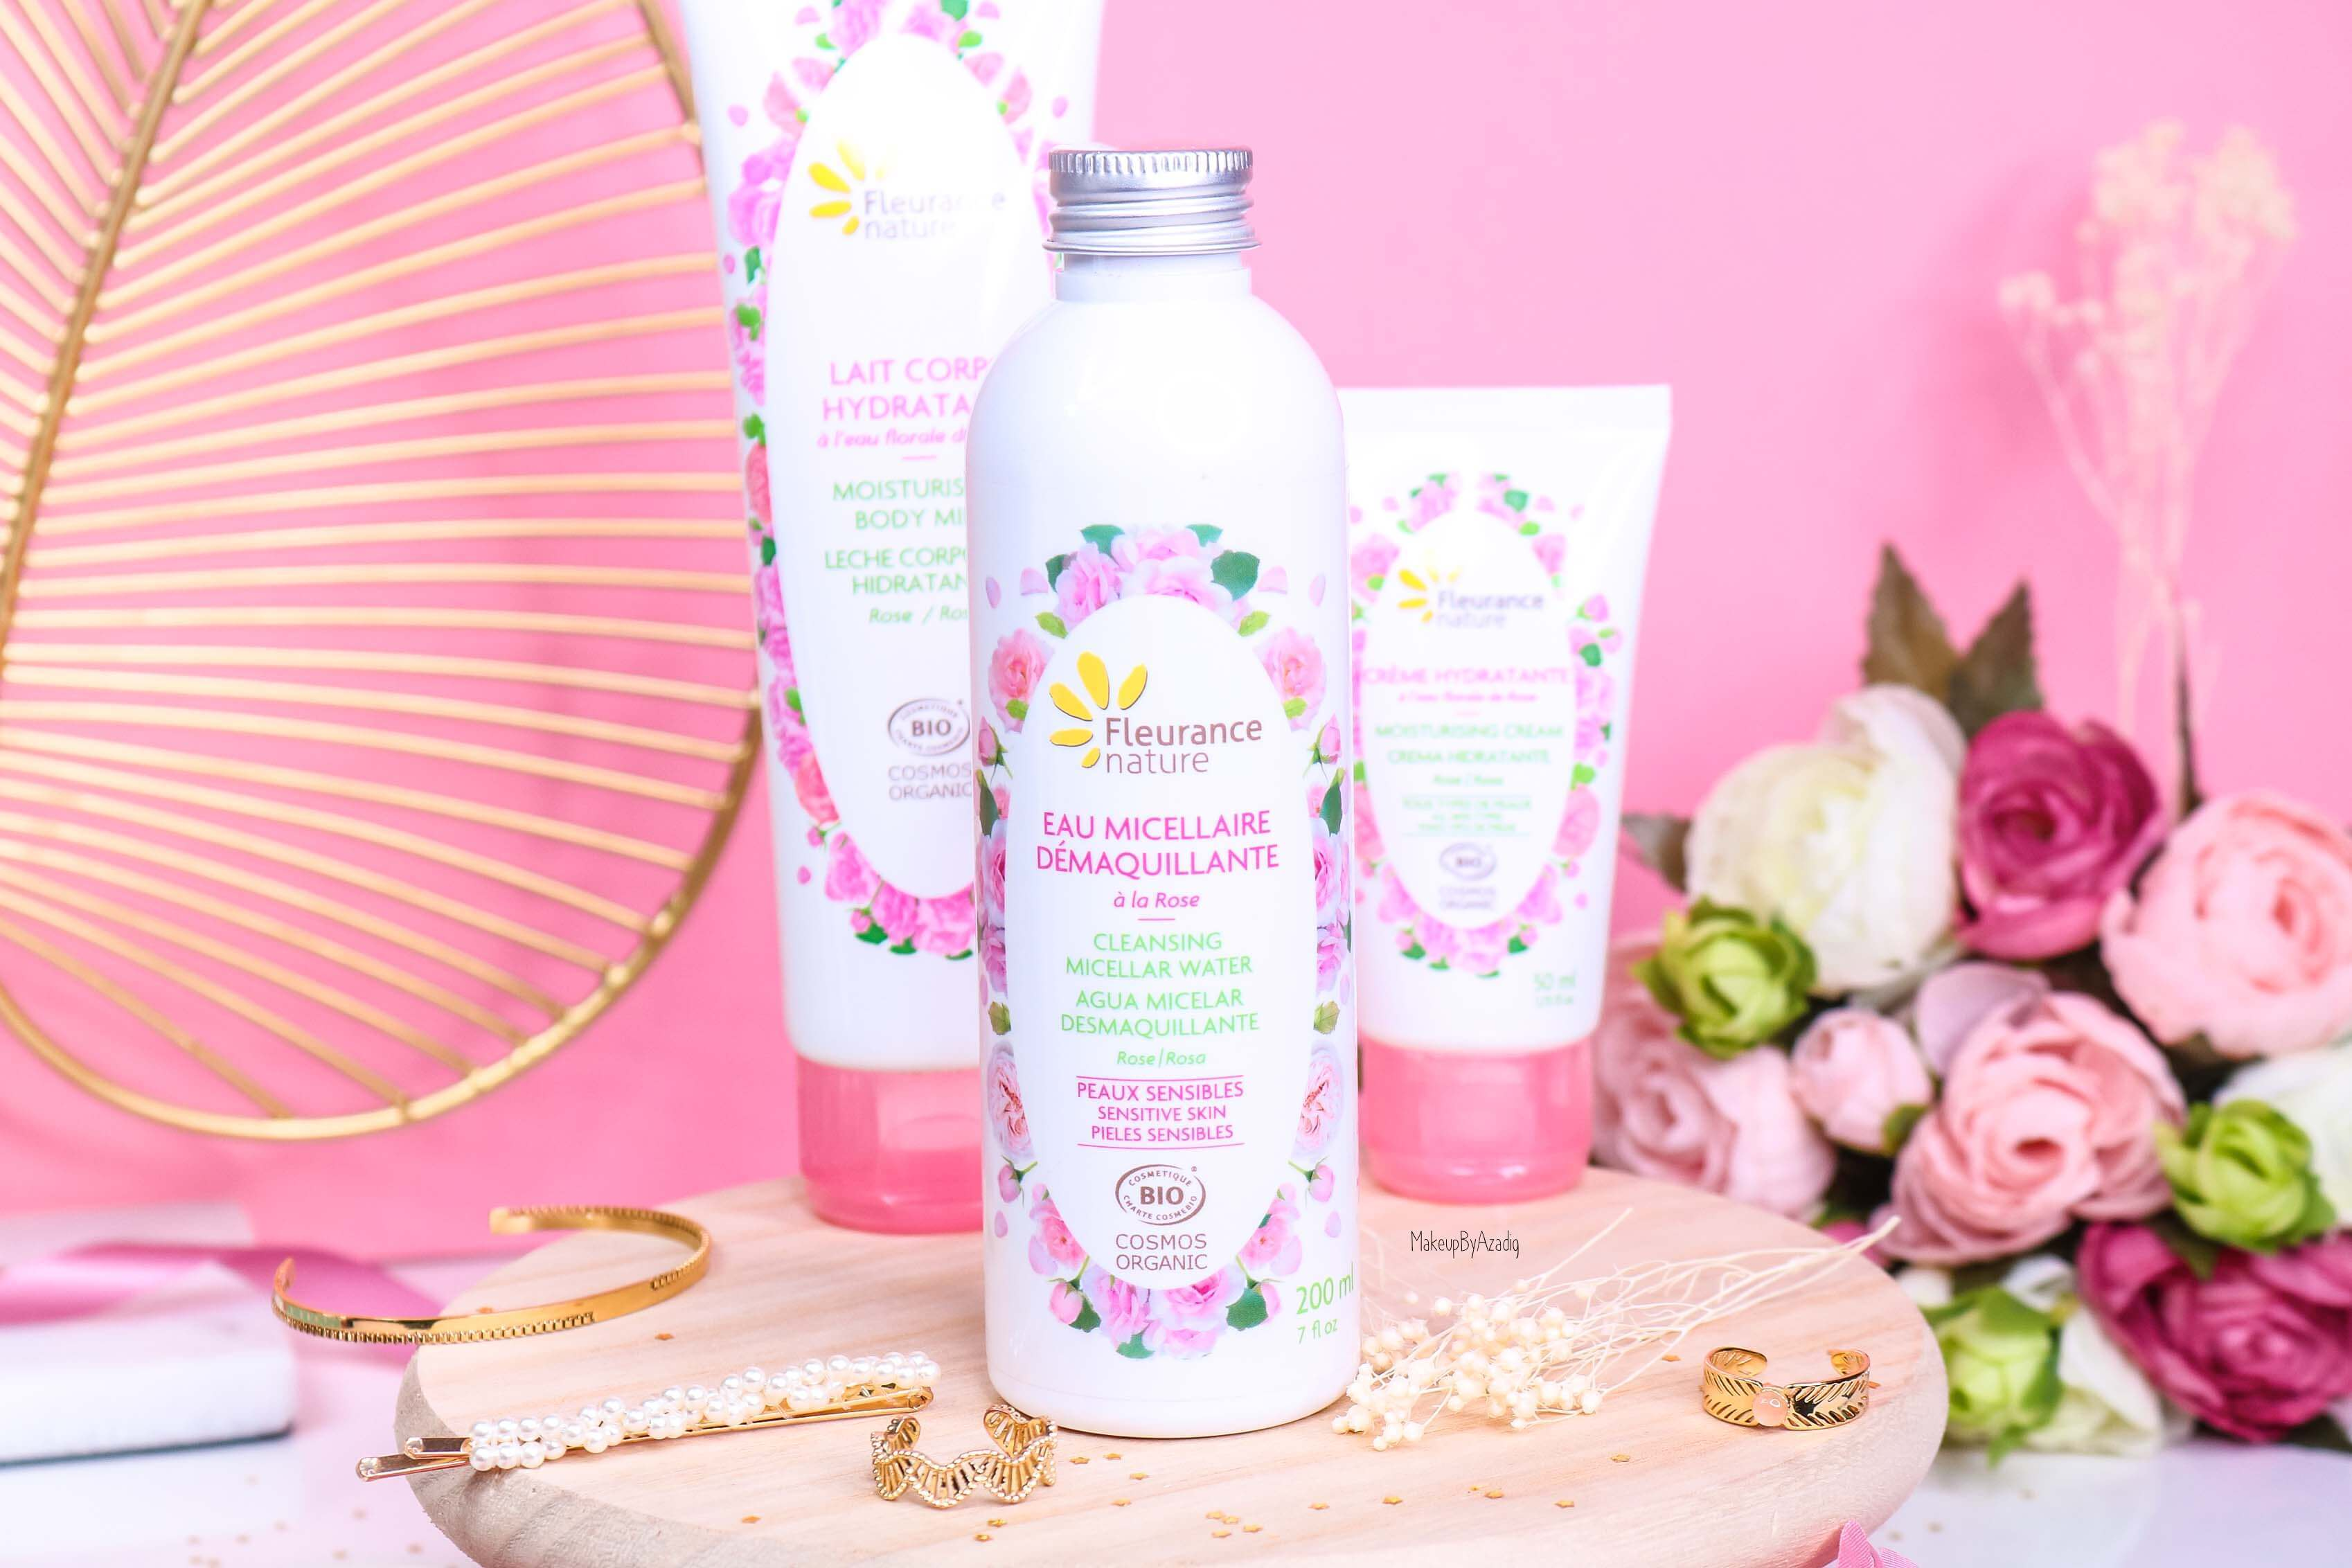 revue-produit-corps-visage-rose-fleurance-nature-hydratant-bio-cosmos-organic-avis-prix-makeupbyazadig-eau-micellaire-efficacite